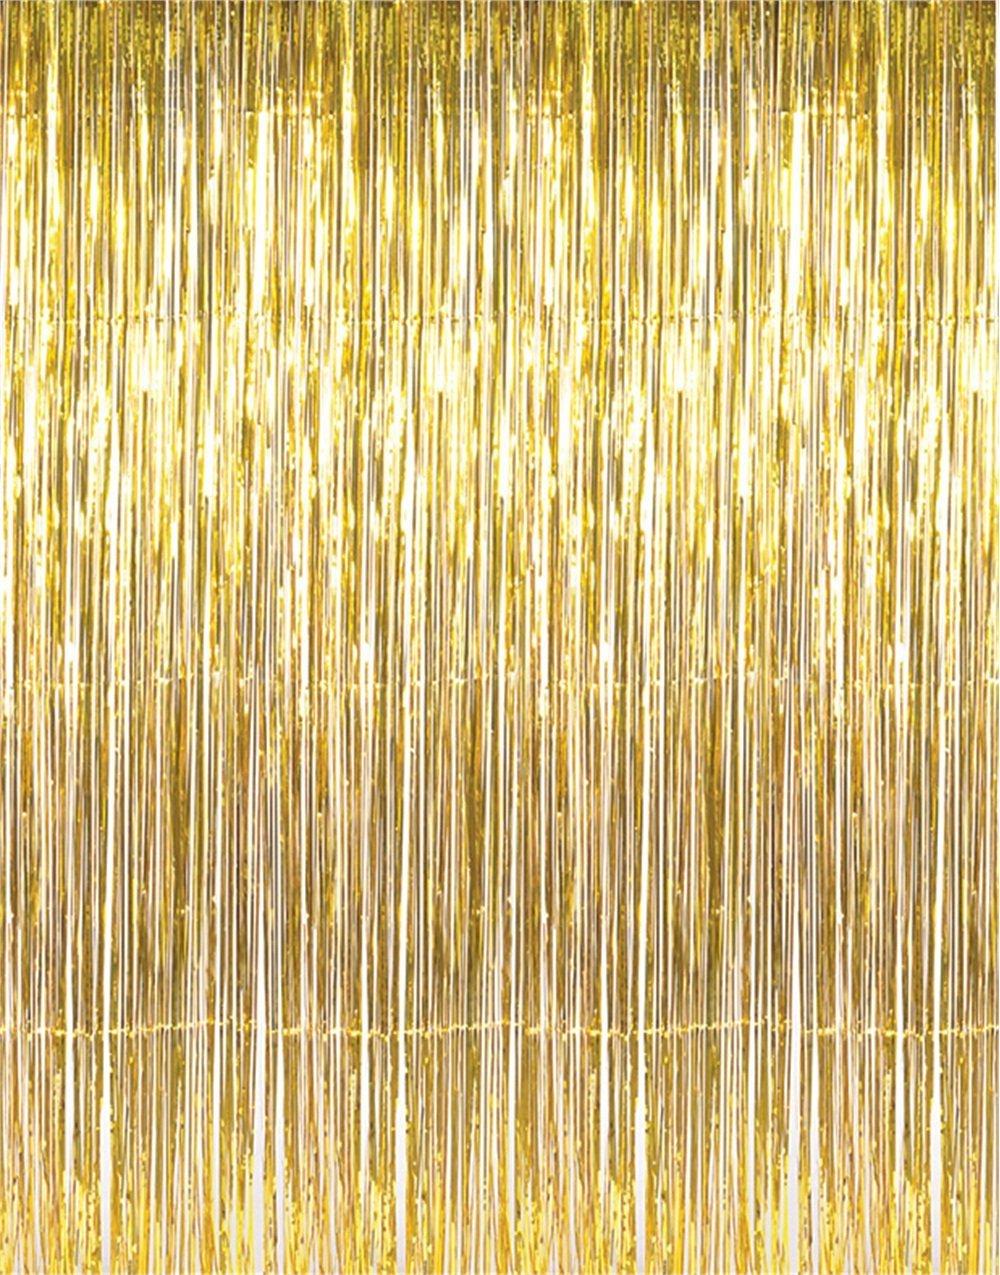 The Pargod, The Divine Curtain